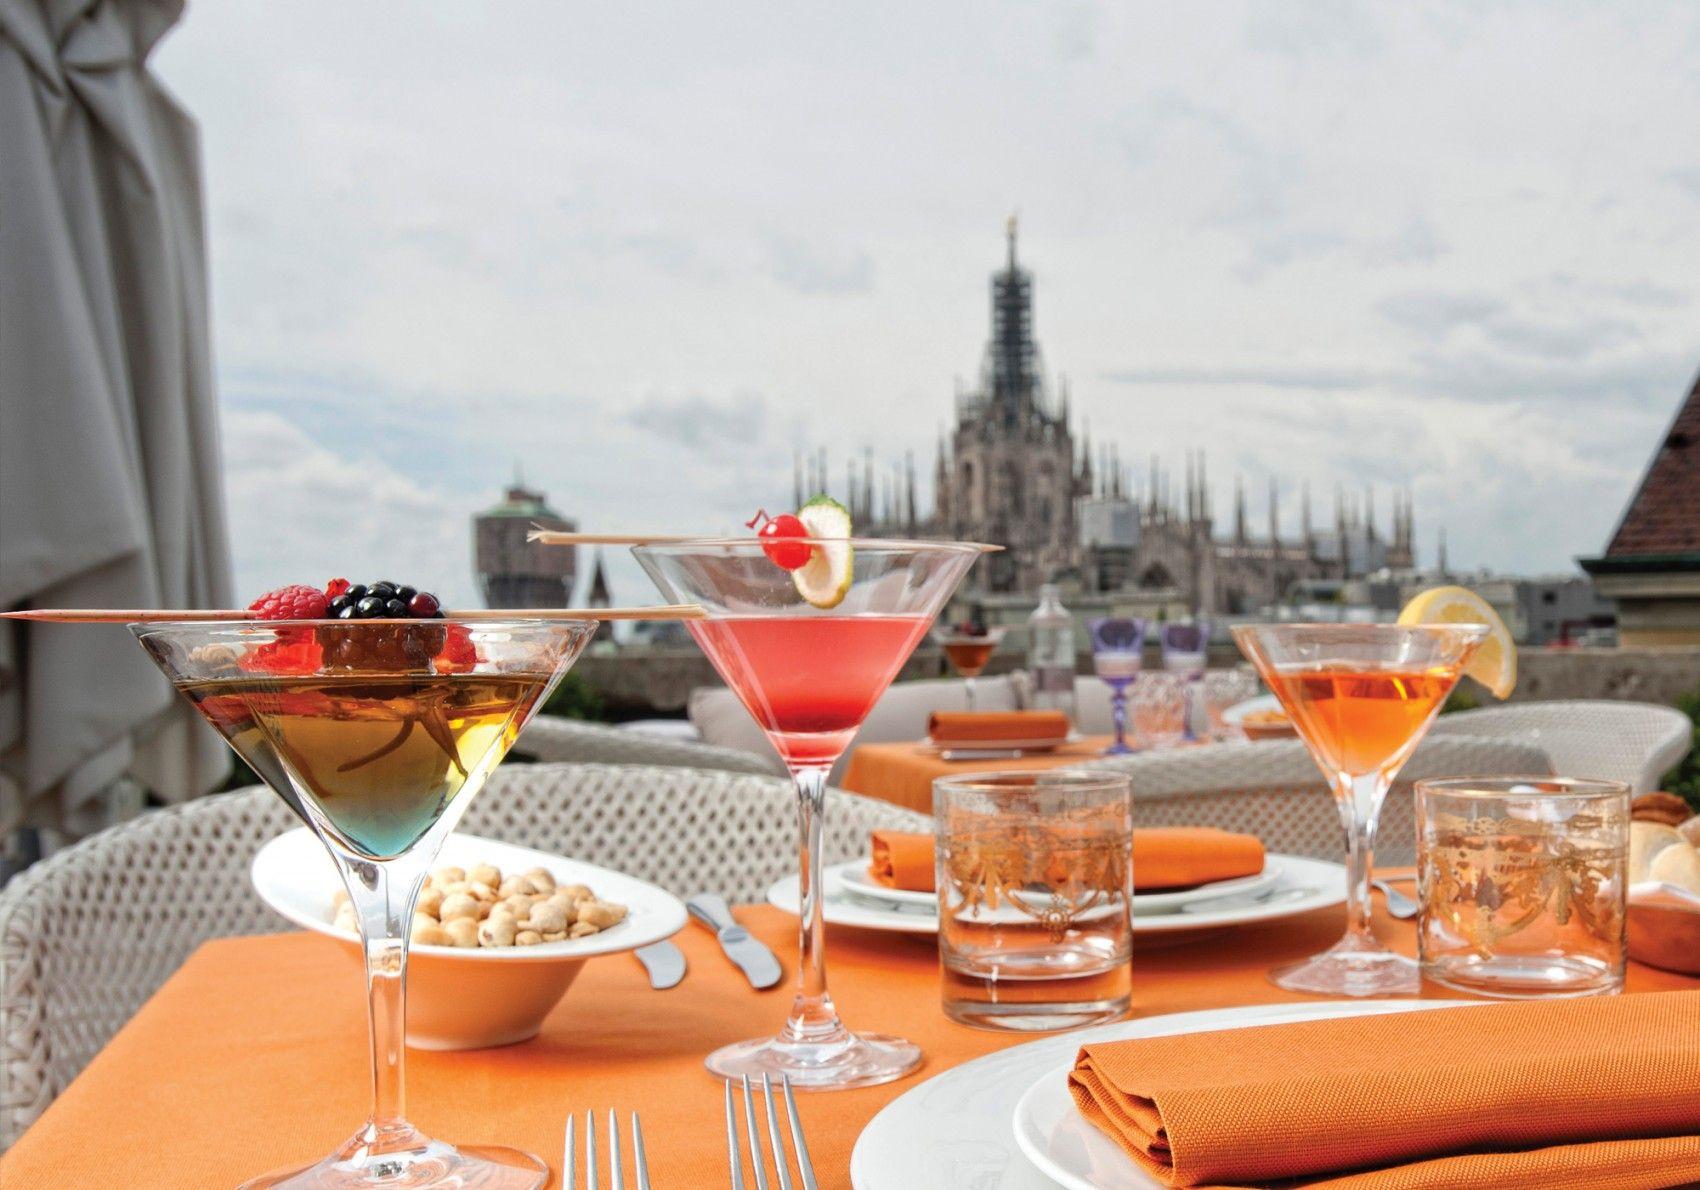 Boscolo Milano Our Milan Hotel Vacation Ideas Luxury